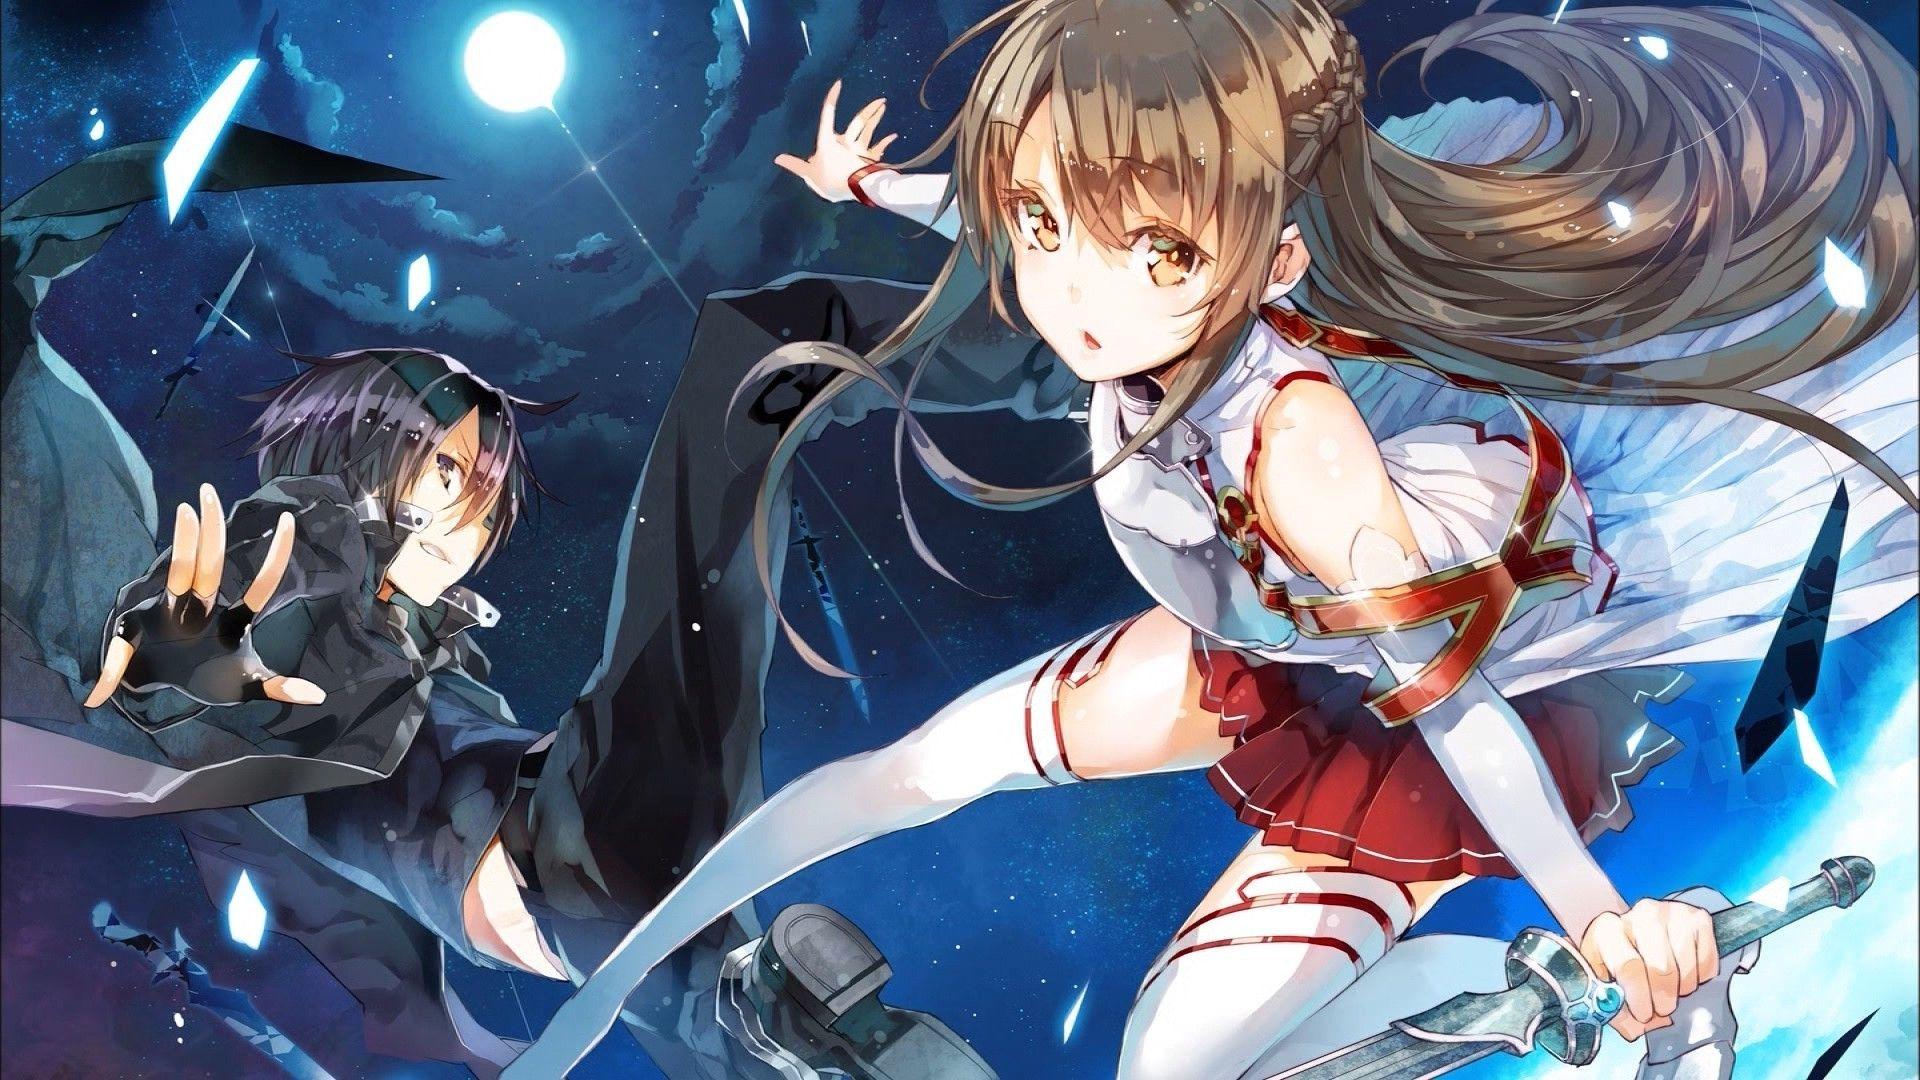 sword art online wallpaper kirito and asuna - google search | sword